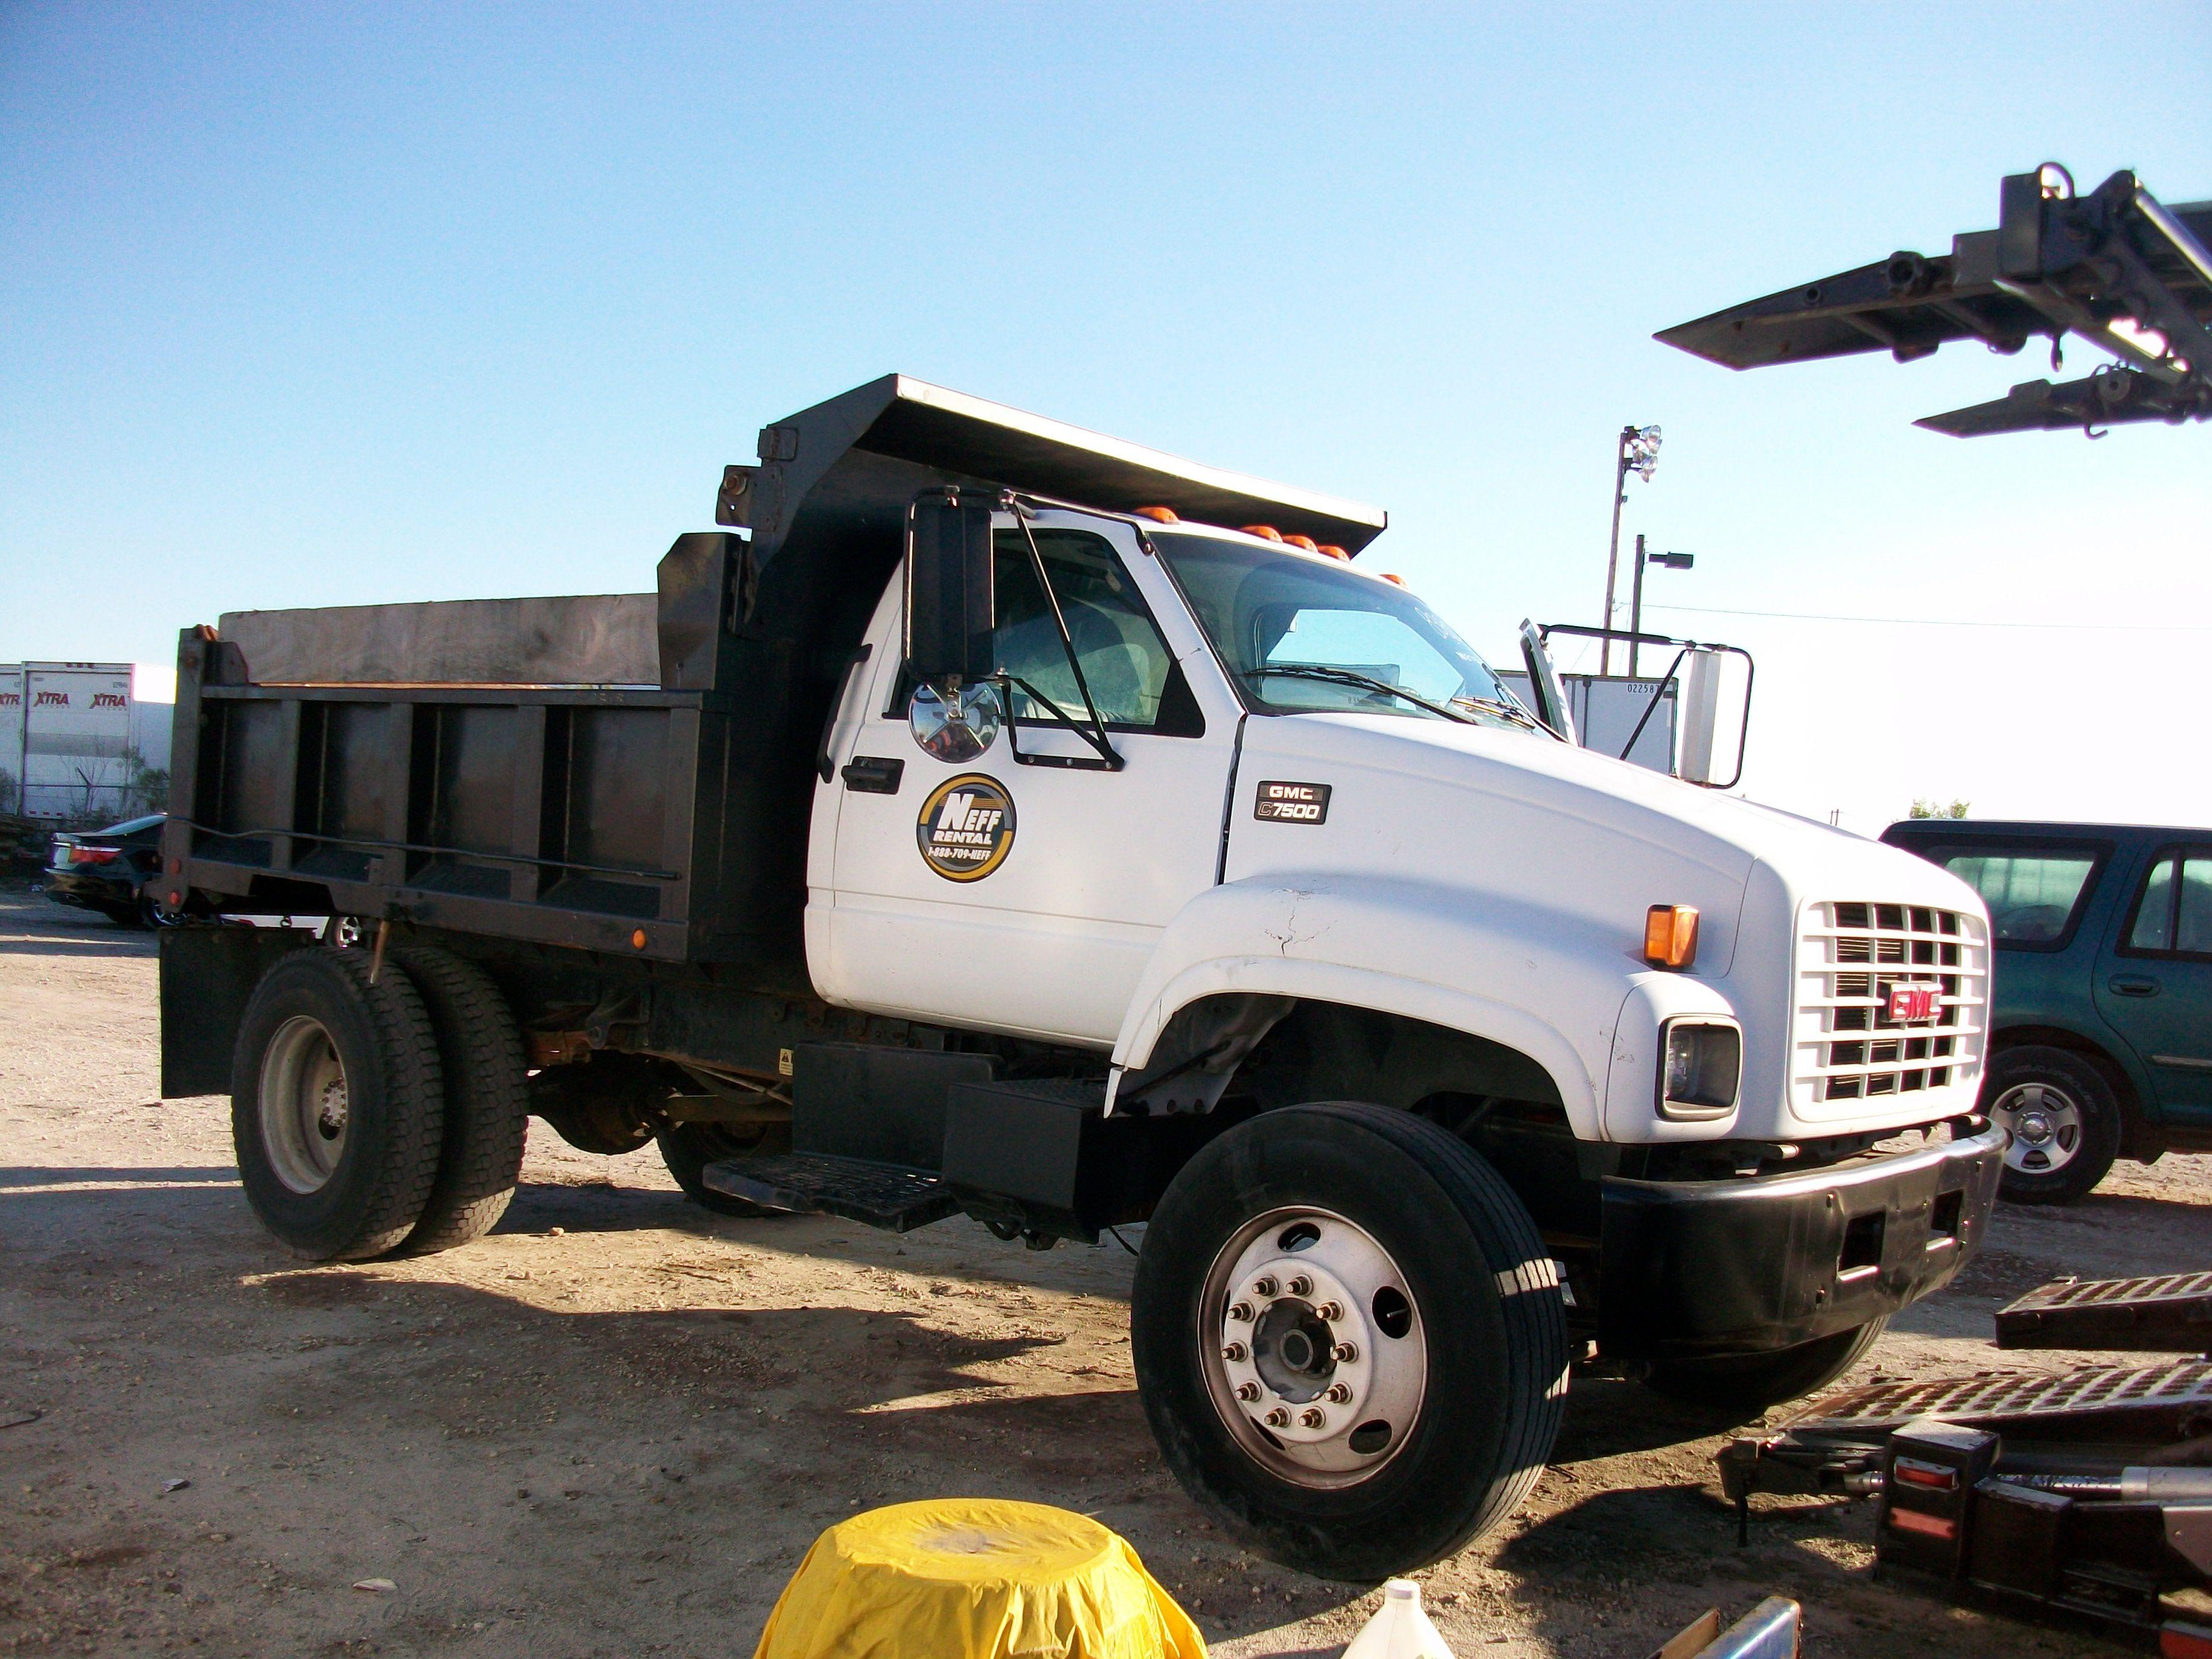 Used 2000 Gmc Dump Truck 7500 For Sale In Fl Truck Gmc Gmc Trucks Gmc Trucks For Sale Trucks